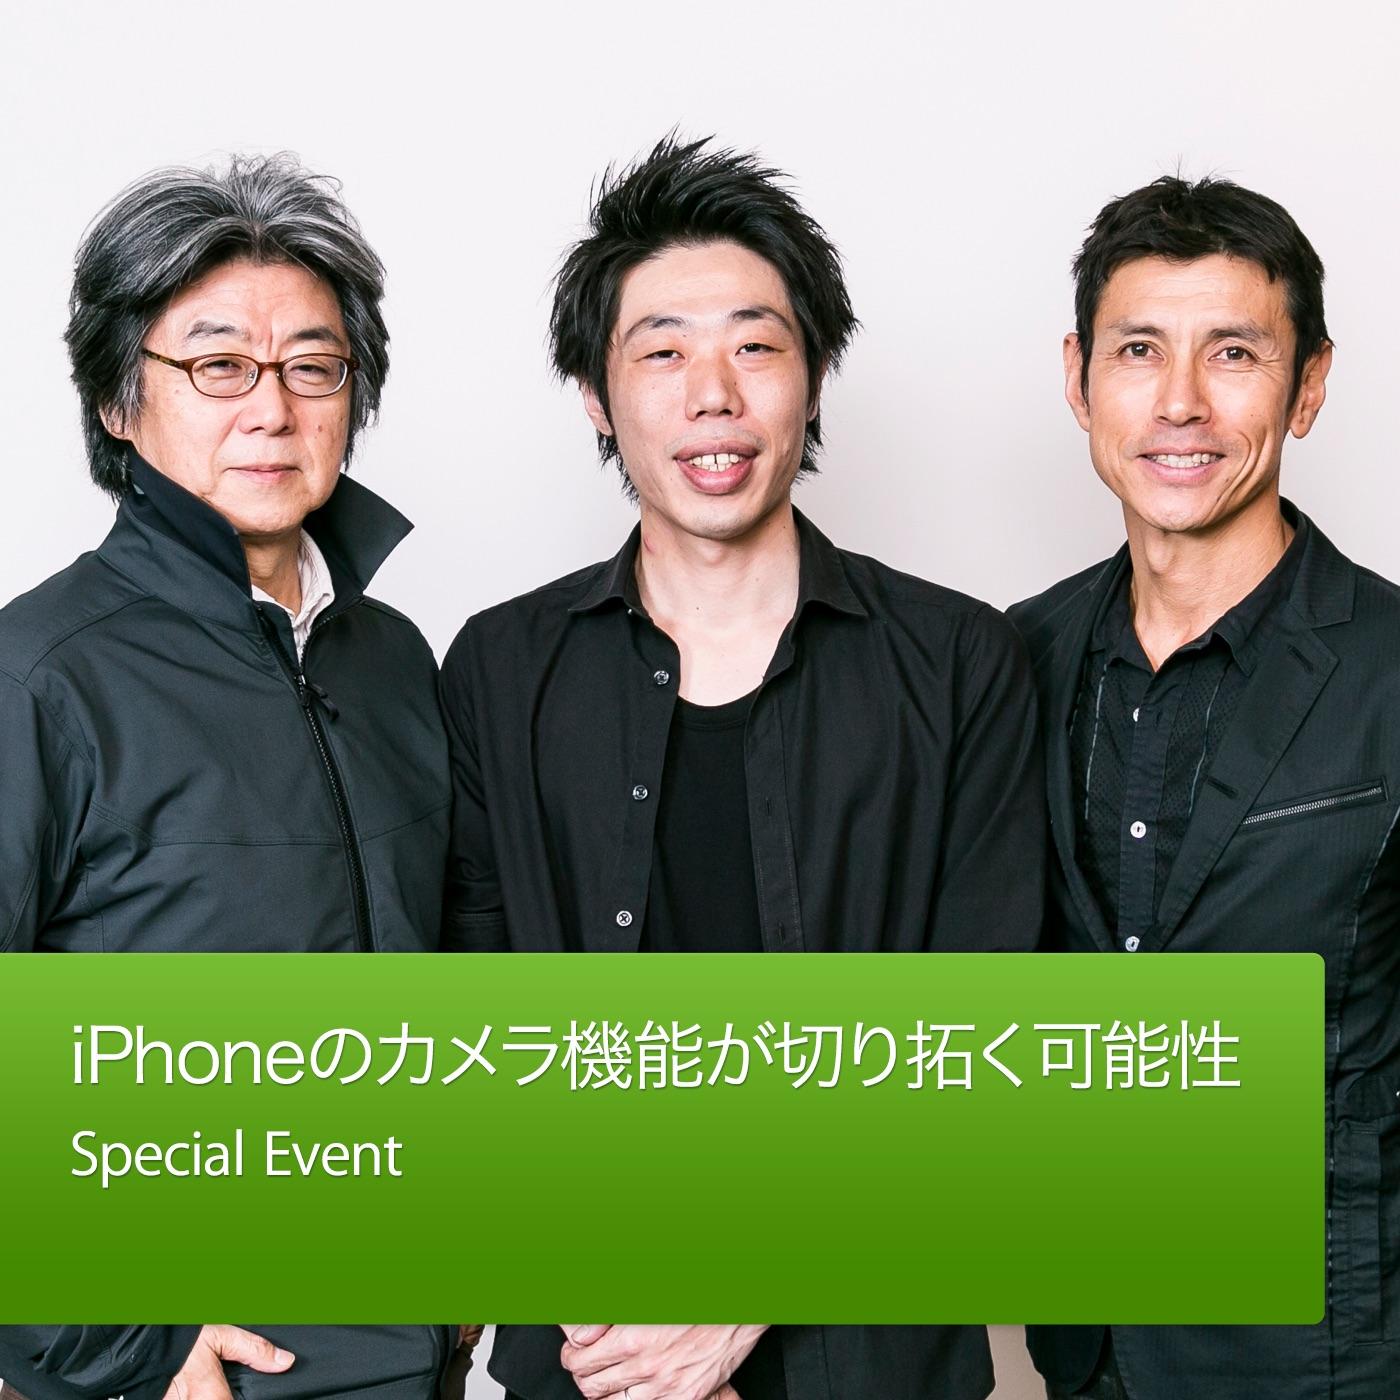 iPhoneのカメラ機能が切り拓く可能性 : Special Event